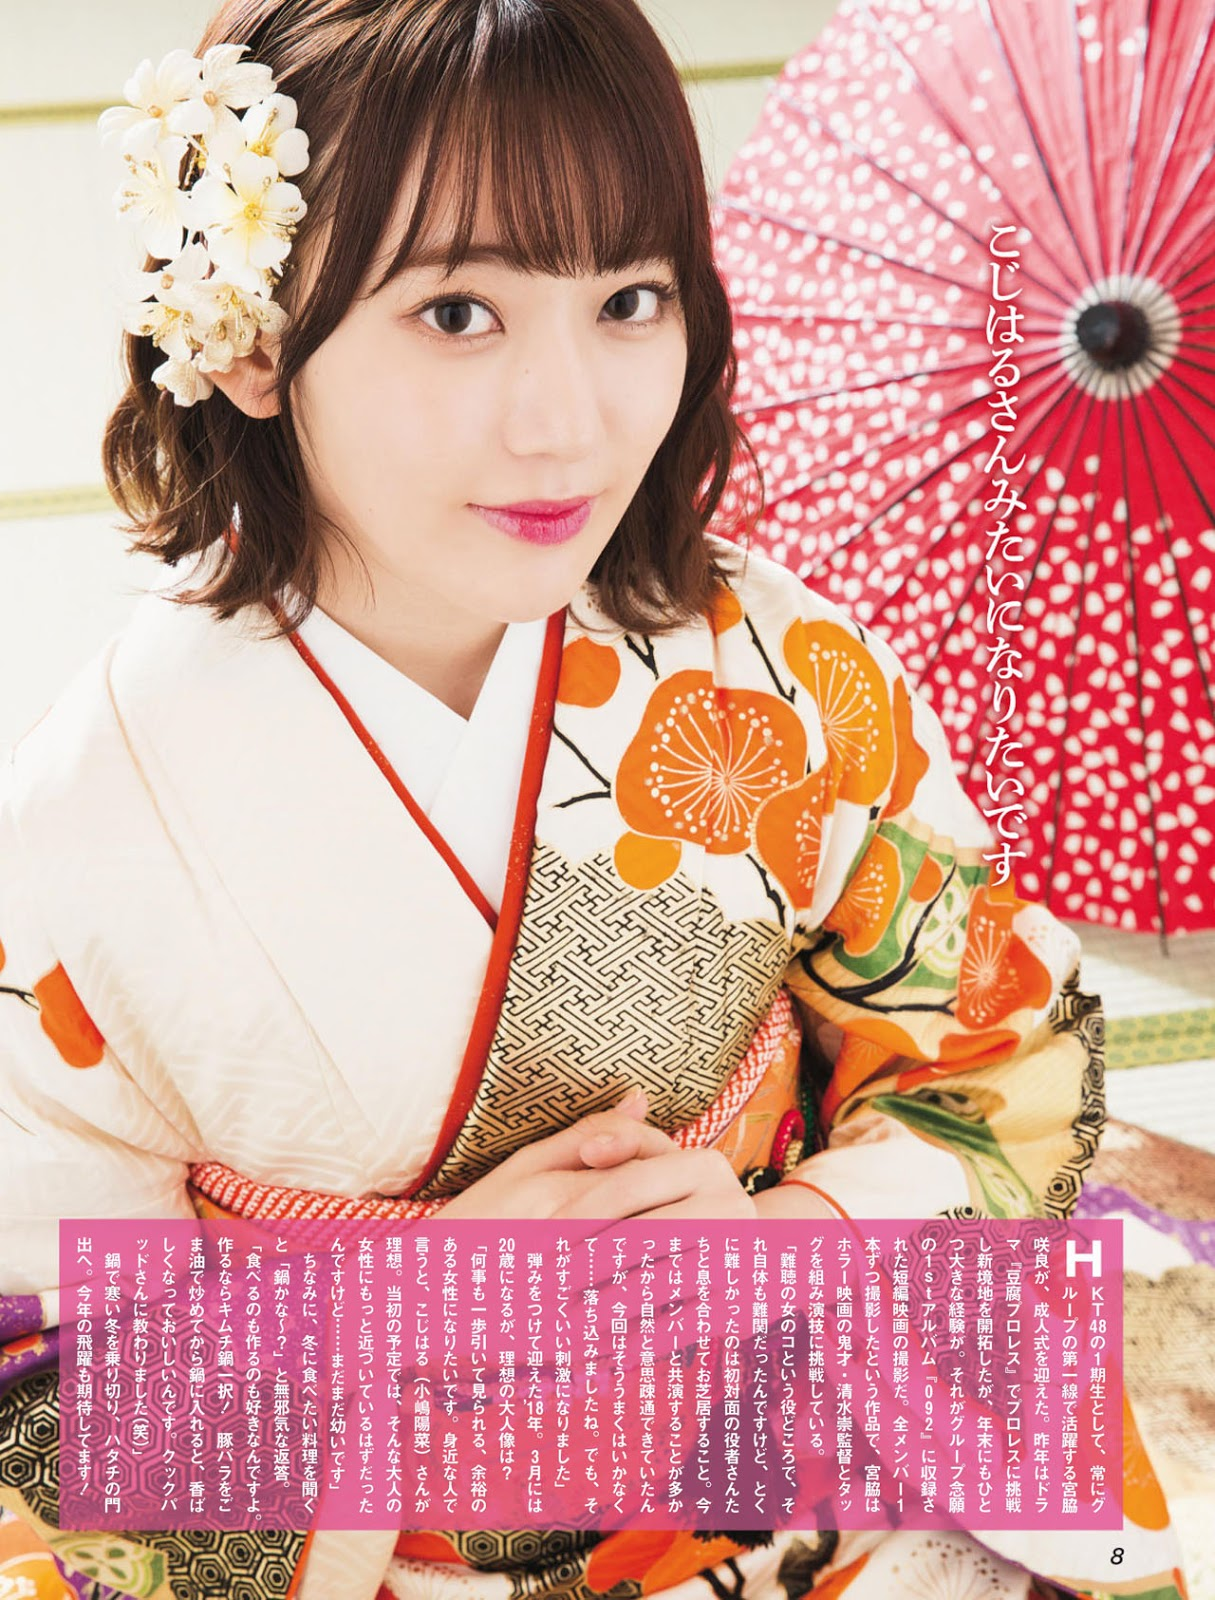 Miyawaki Sakura 宮脇咲良, Moriyasu Madoka 森保まどか, Weekly SPA! 2018.01.16 (週刊SPA! 2018年01月16日号)